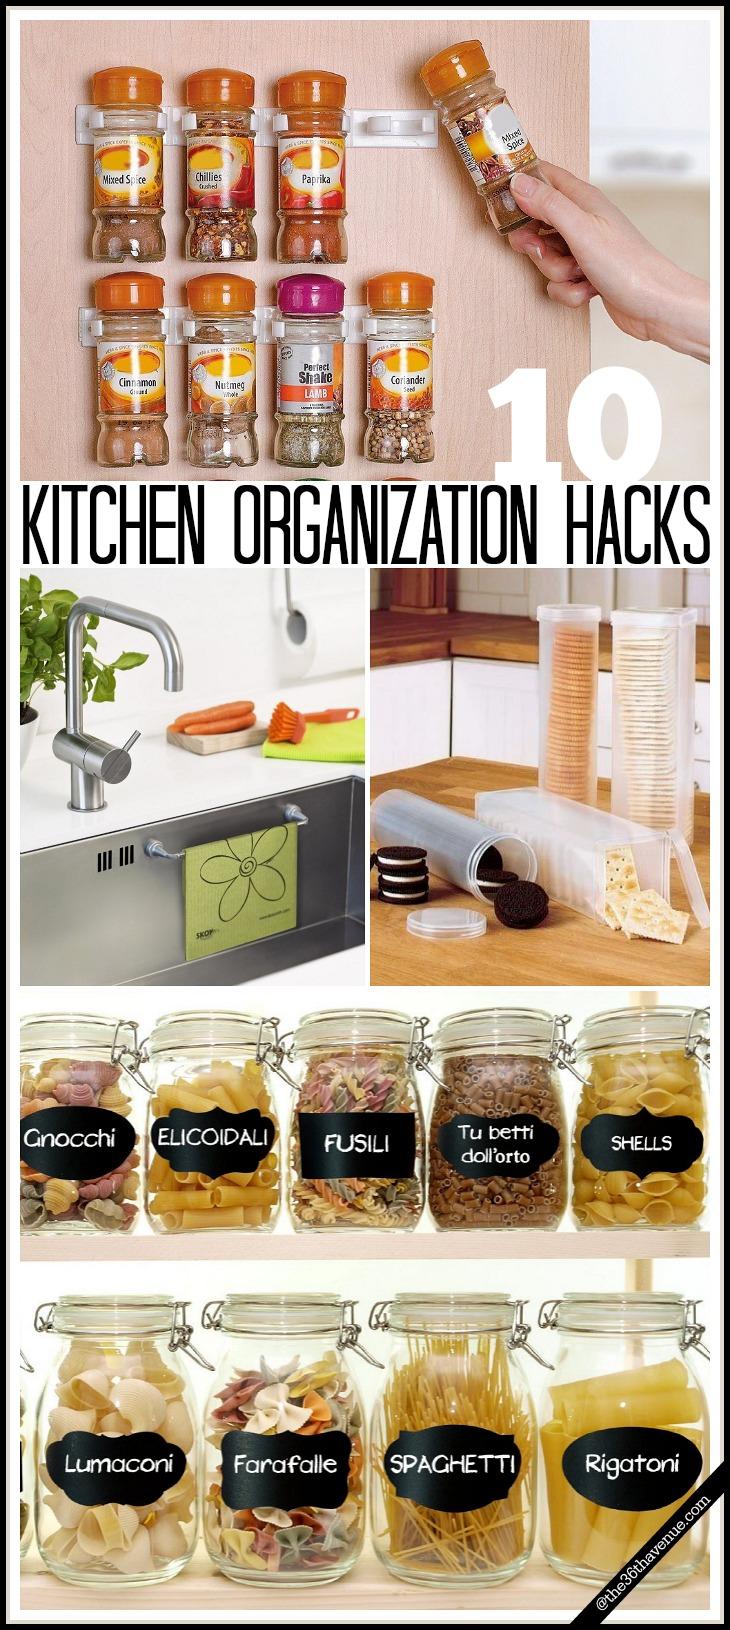 Kitchen Organization Hacks the36thavenue.com